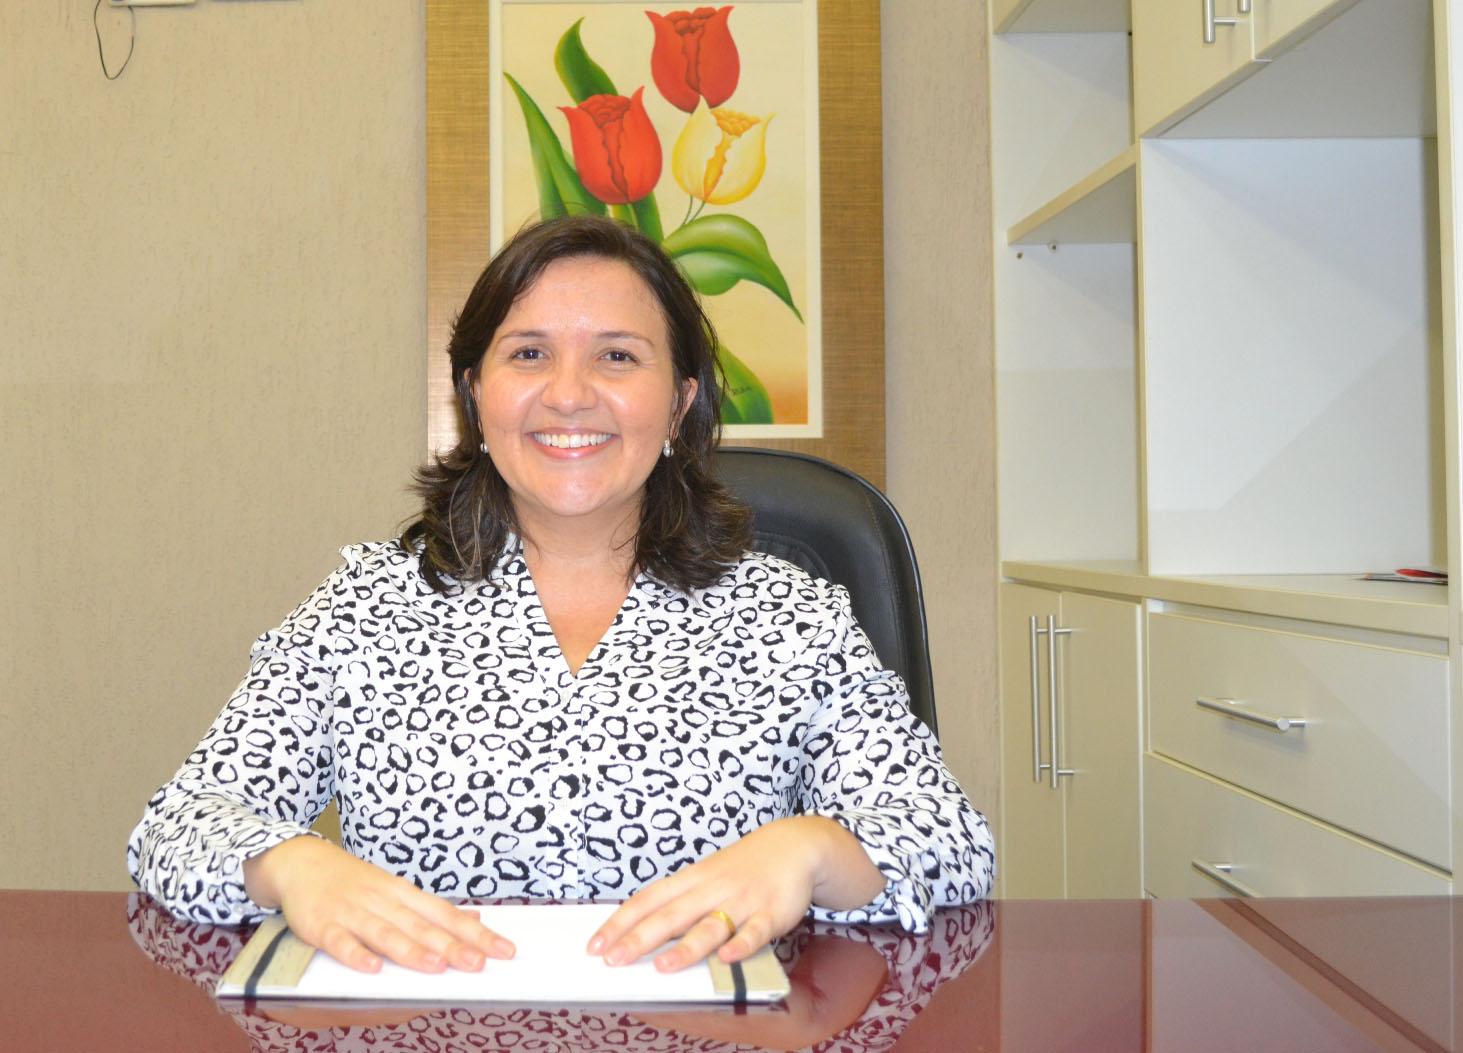 Lidiane Garcia parabeniza os professores pelo seu dia (Foto: Erivan Silva)